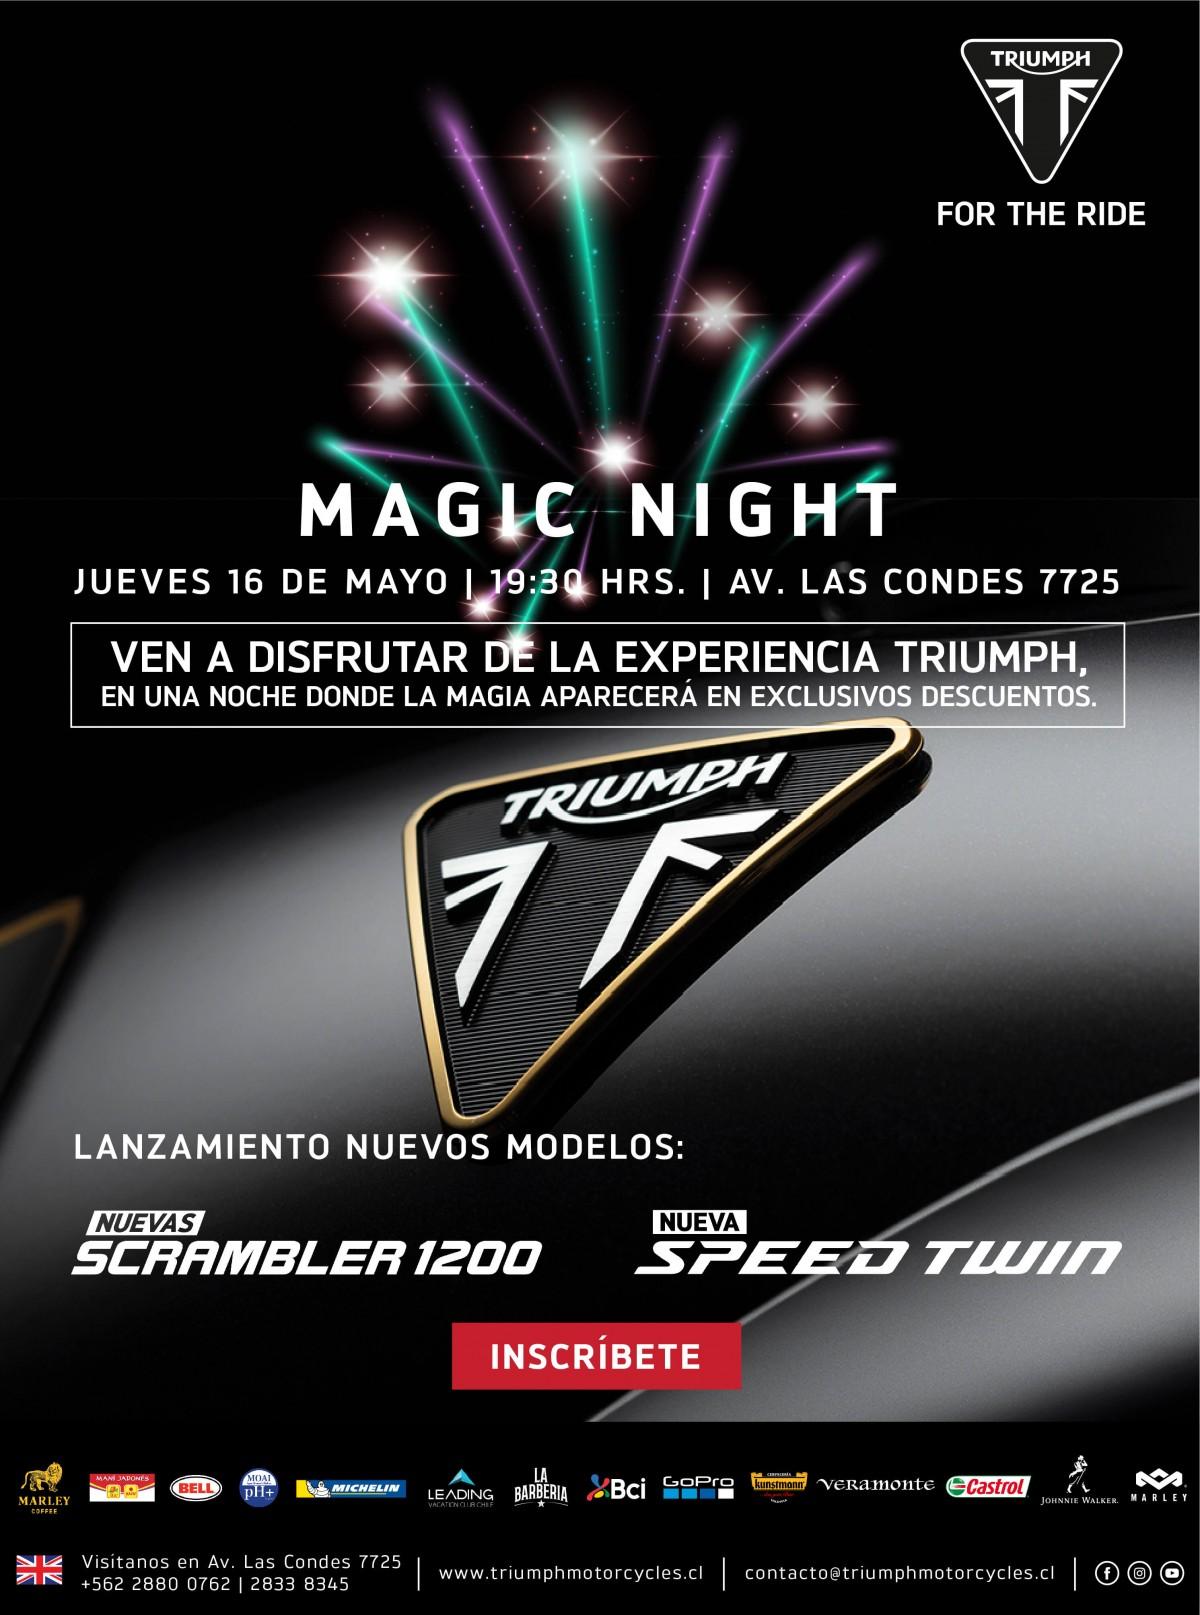 Triumph Magic Night 2019